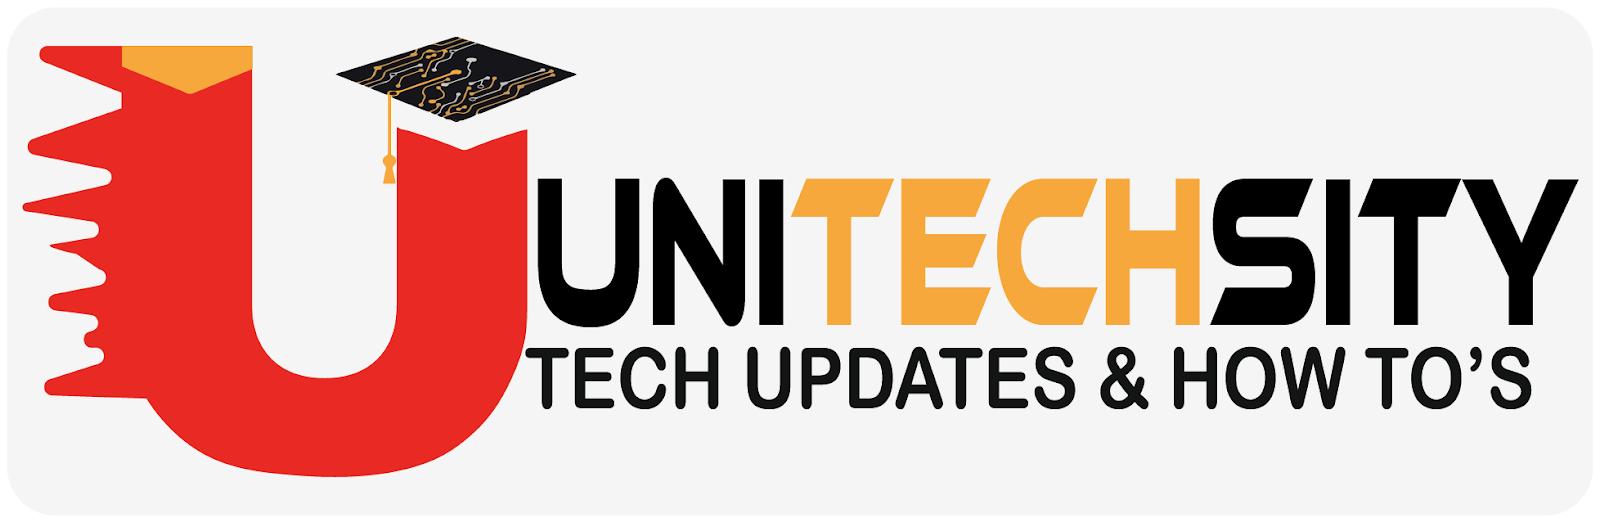 Unitechsity - Latest tech news & updates